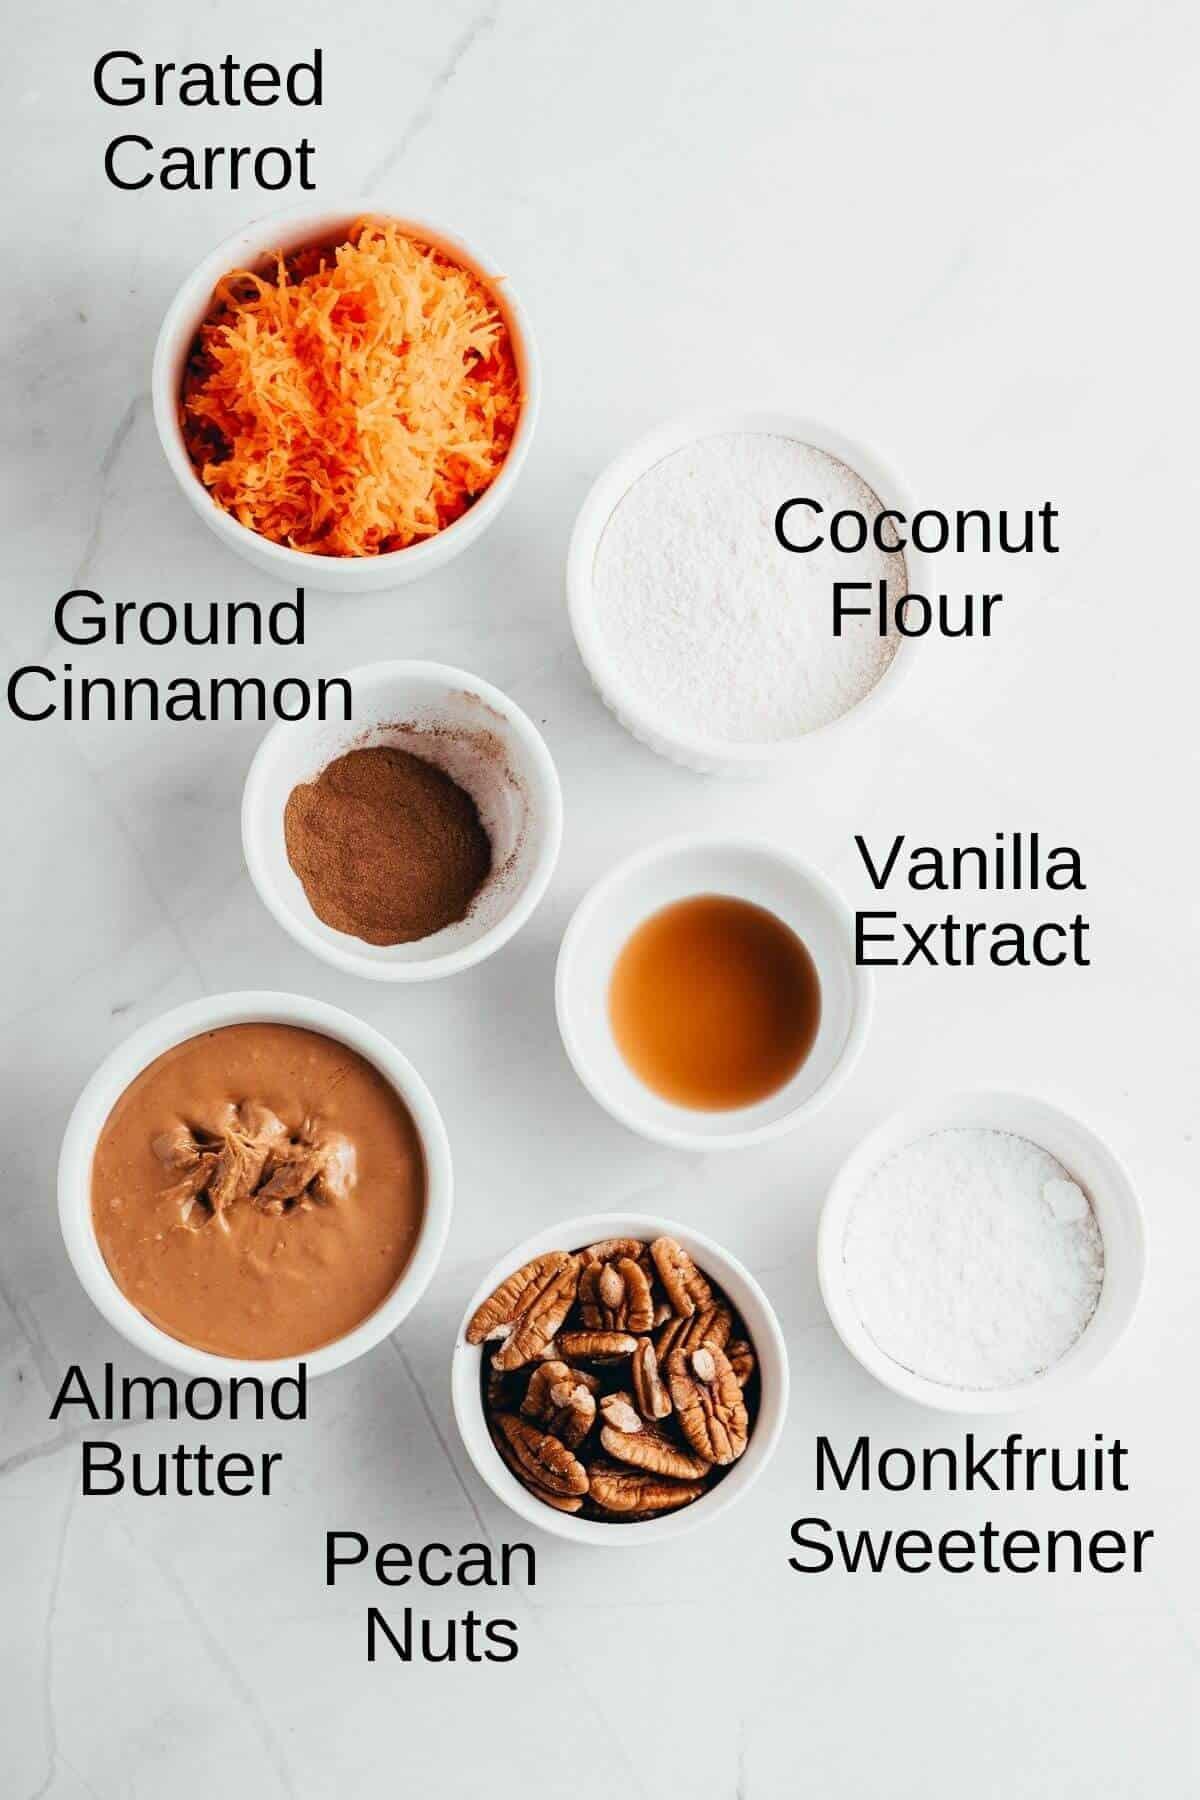 ingredients needed to make carrot cake balls